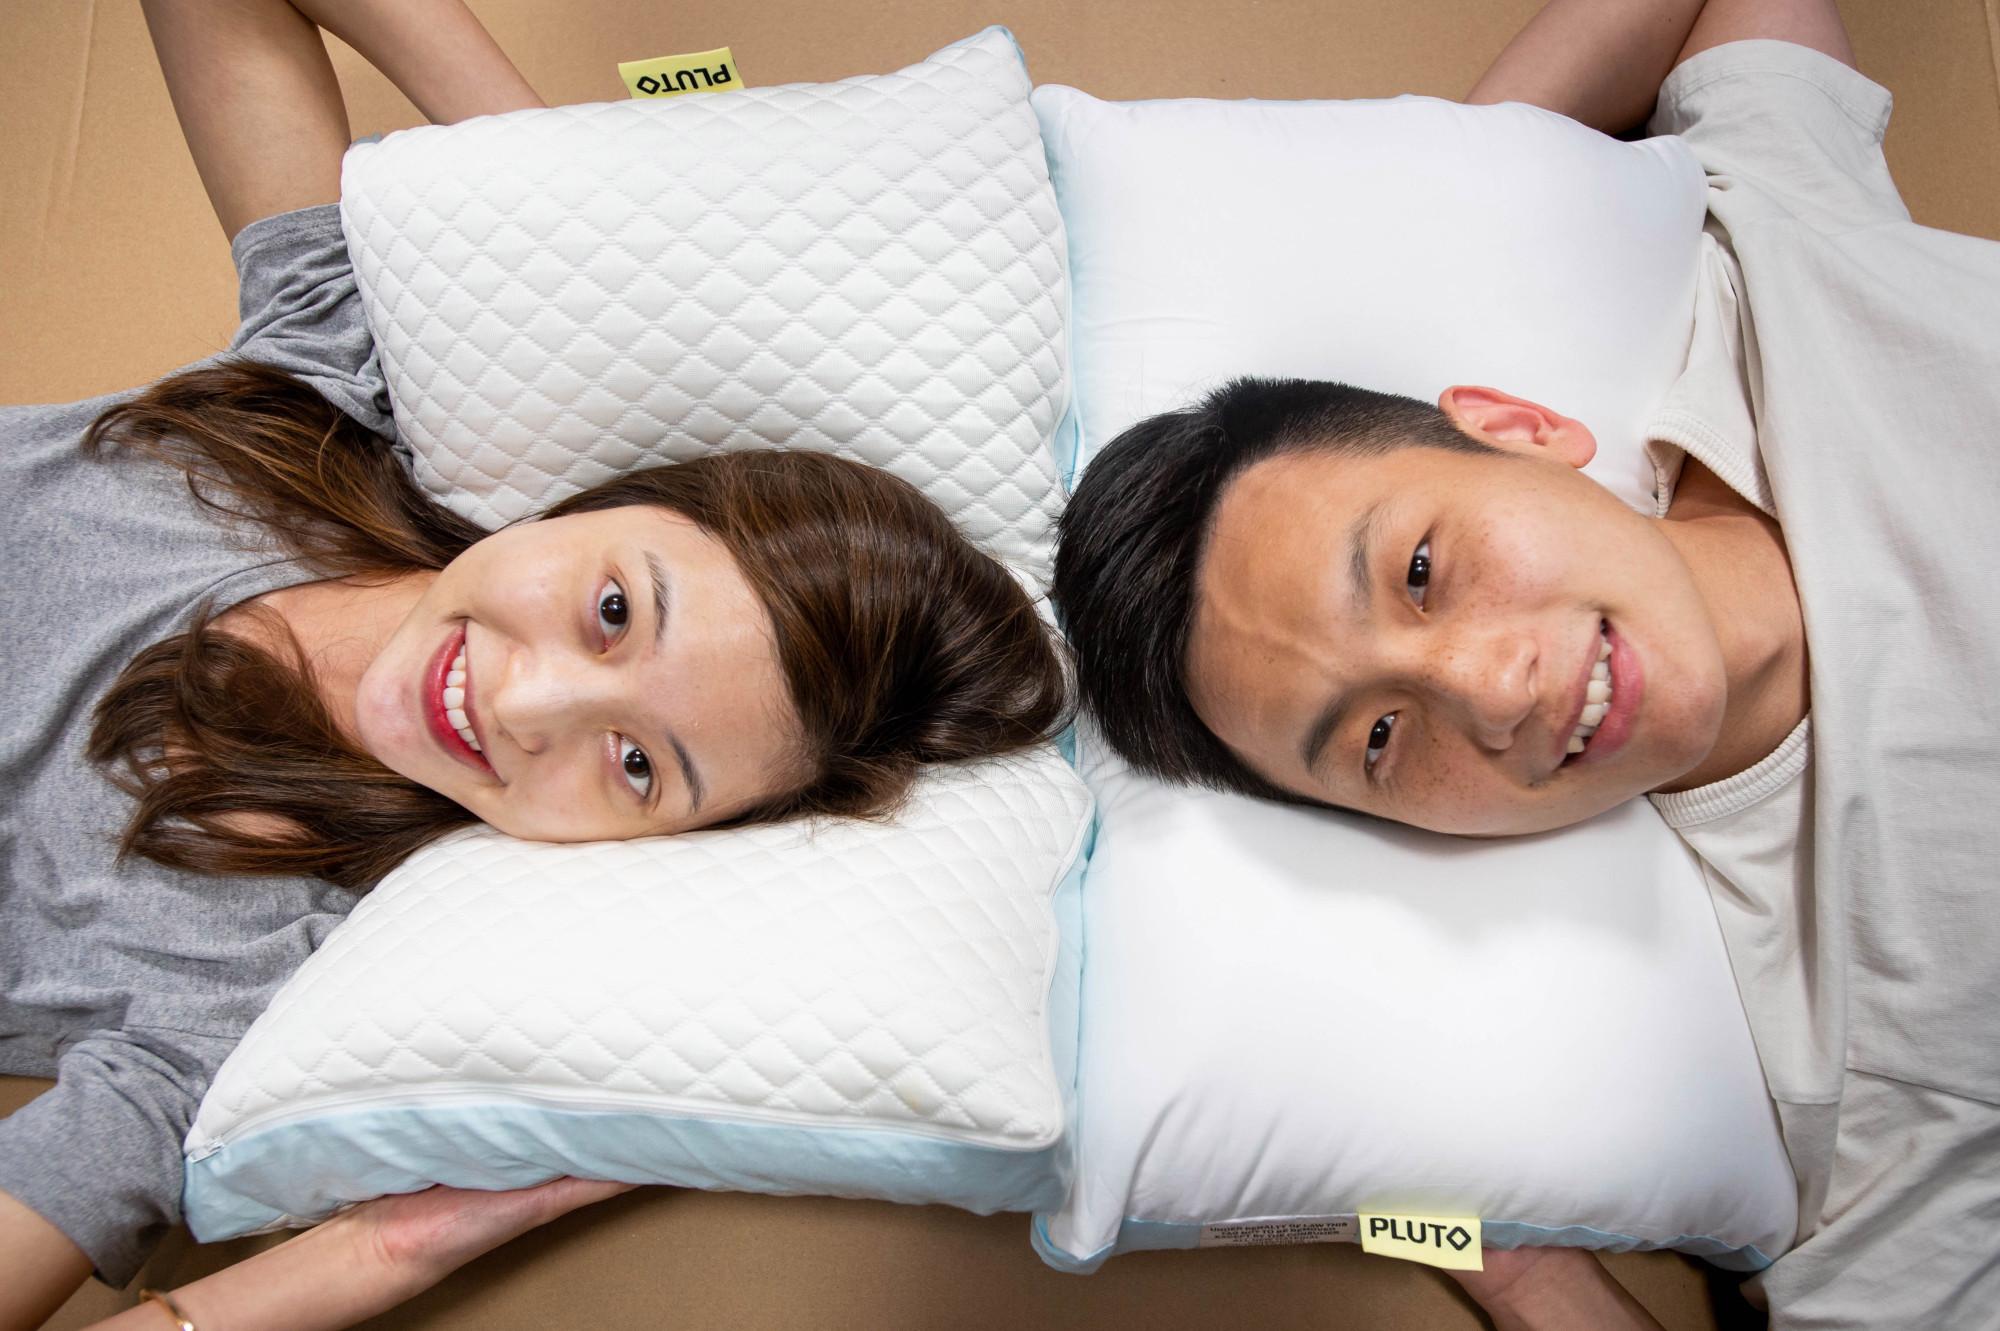 https www pasadenastarnews com 2021 05 12 city of industry businessfolk jump into shark tank do custom pillows assure soft landing